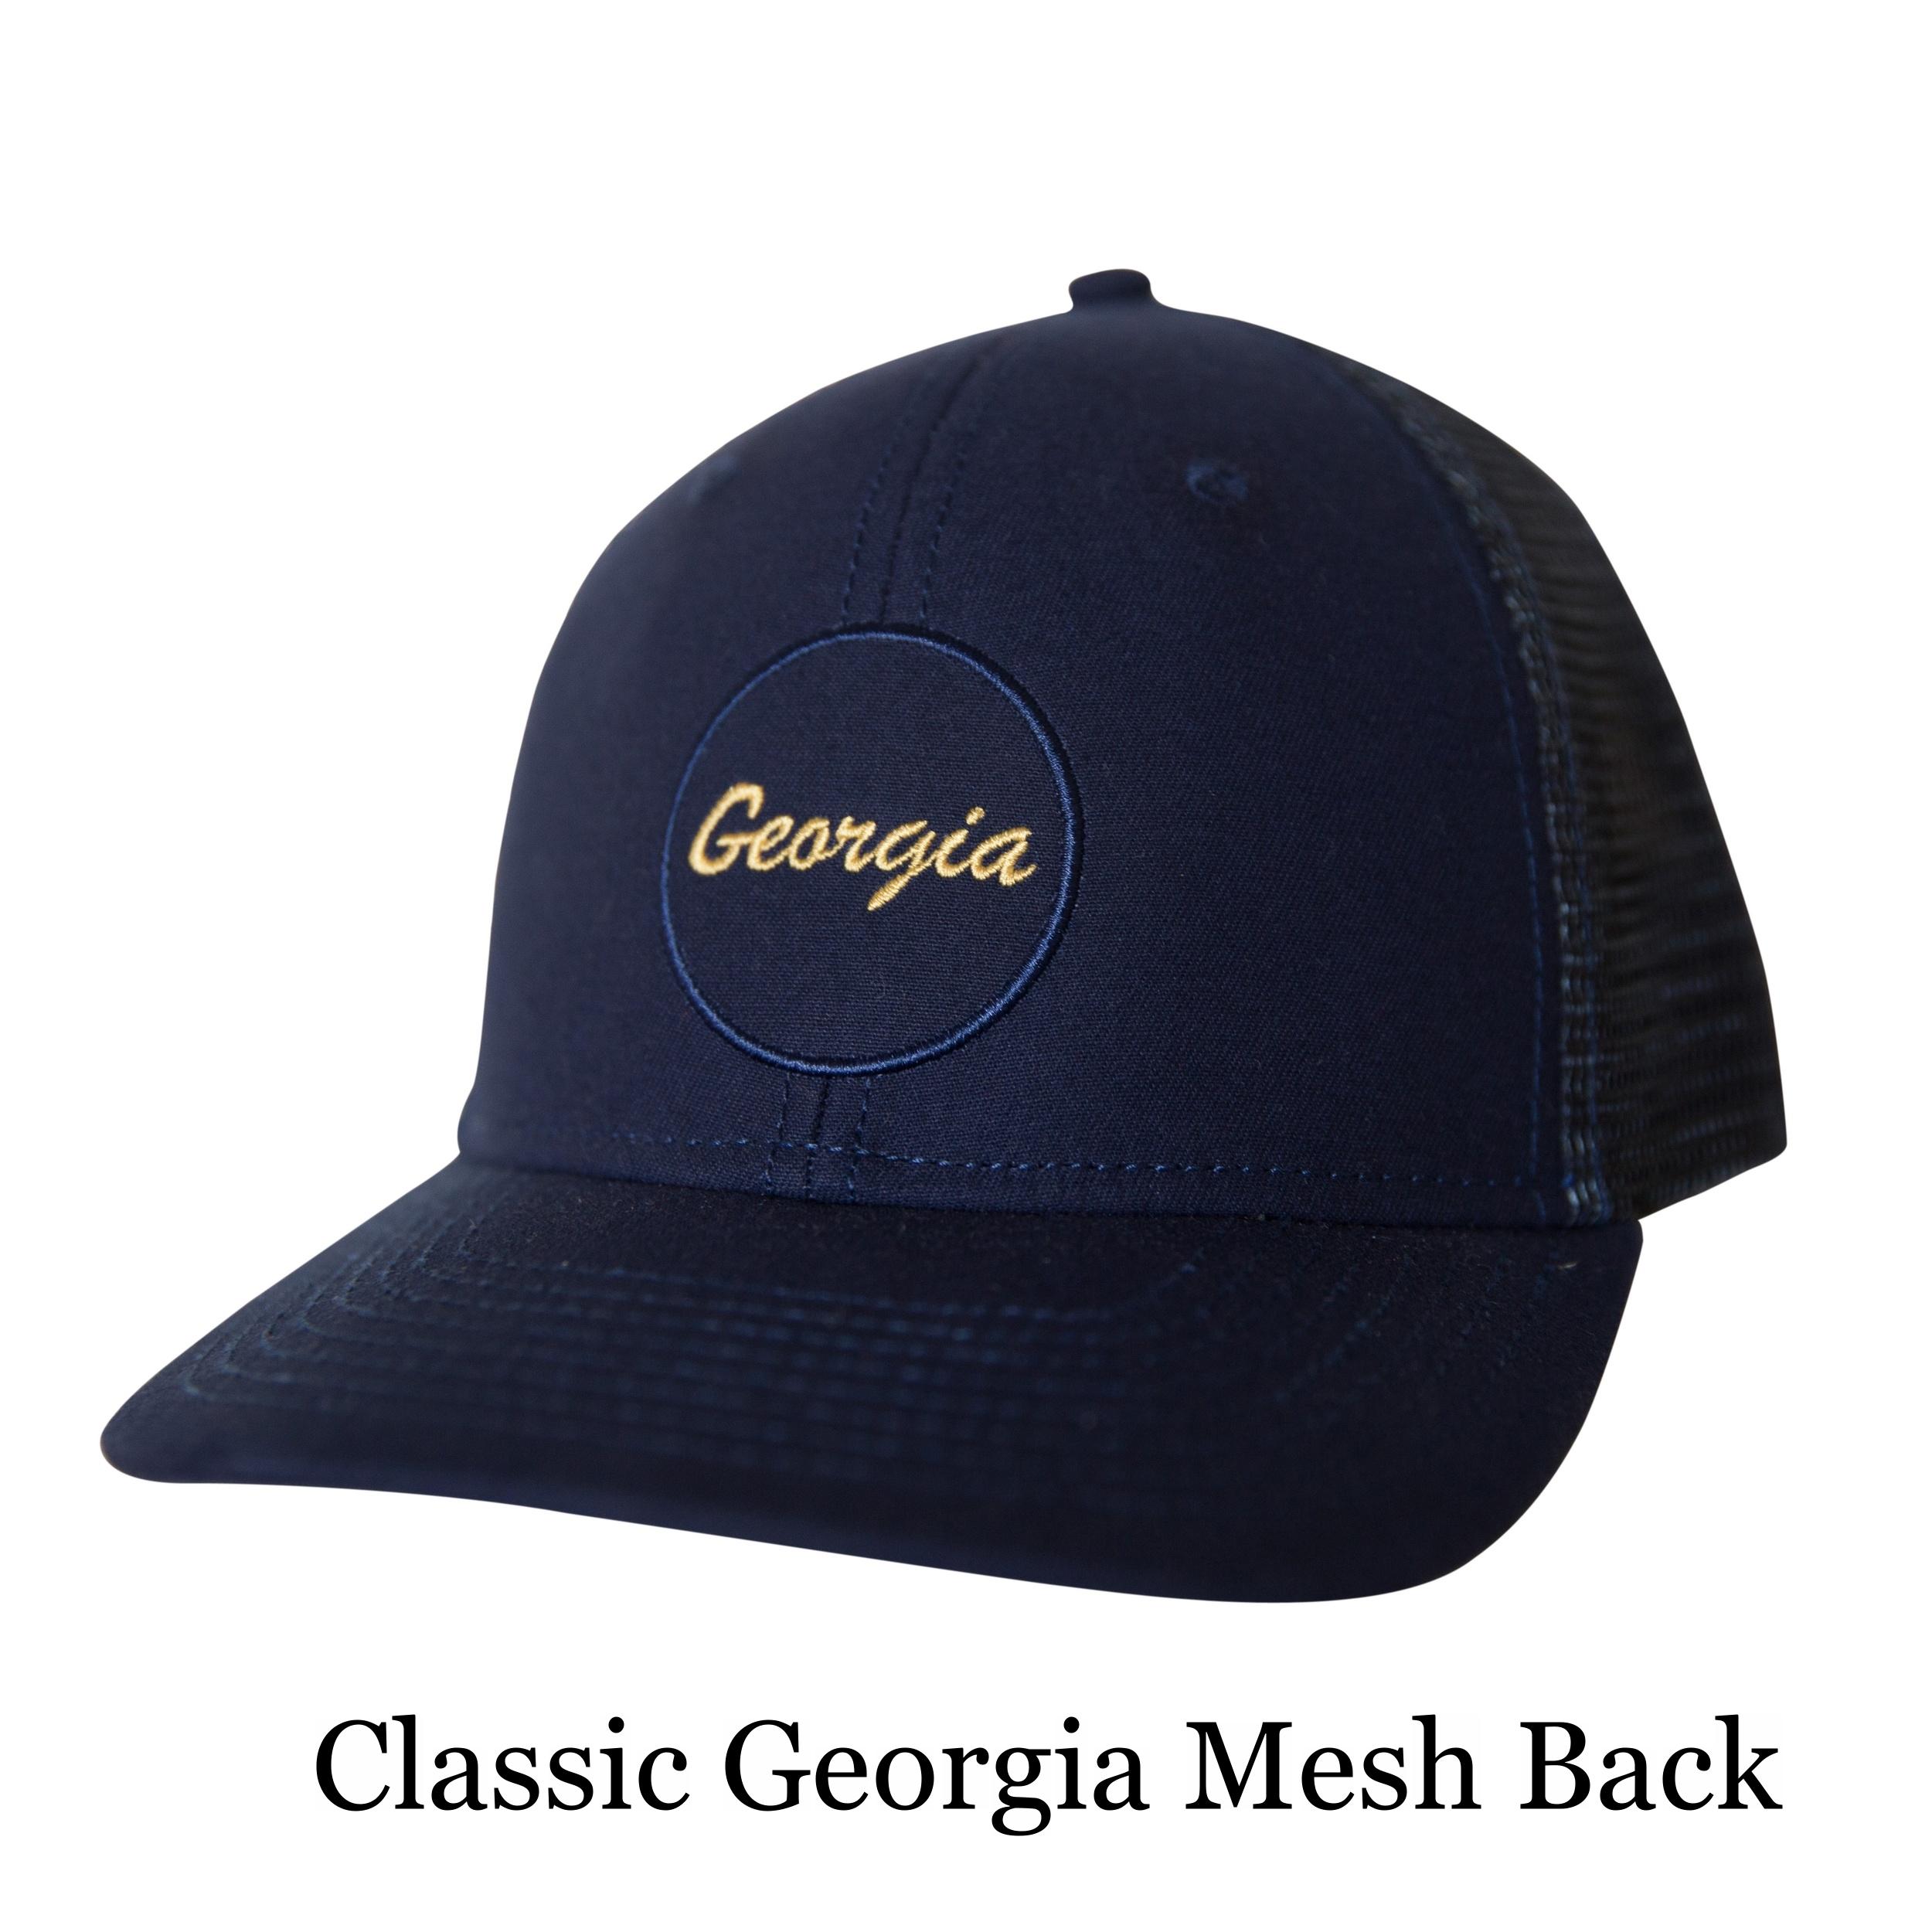 Classic Georgia Mesh Back